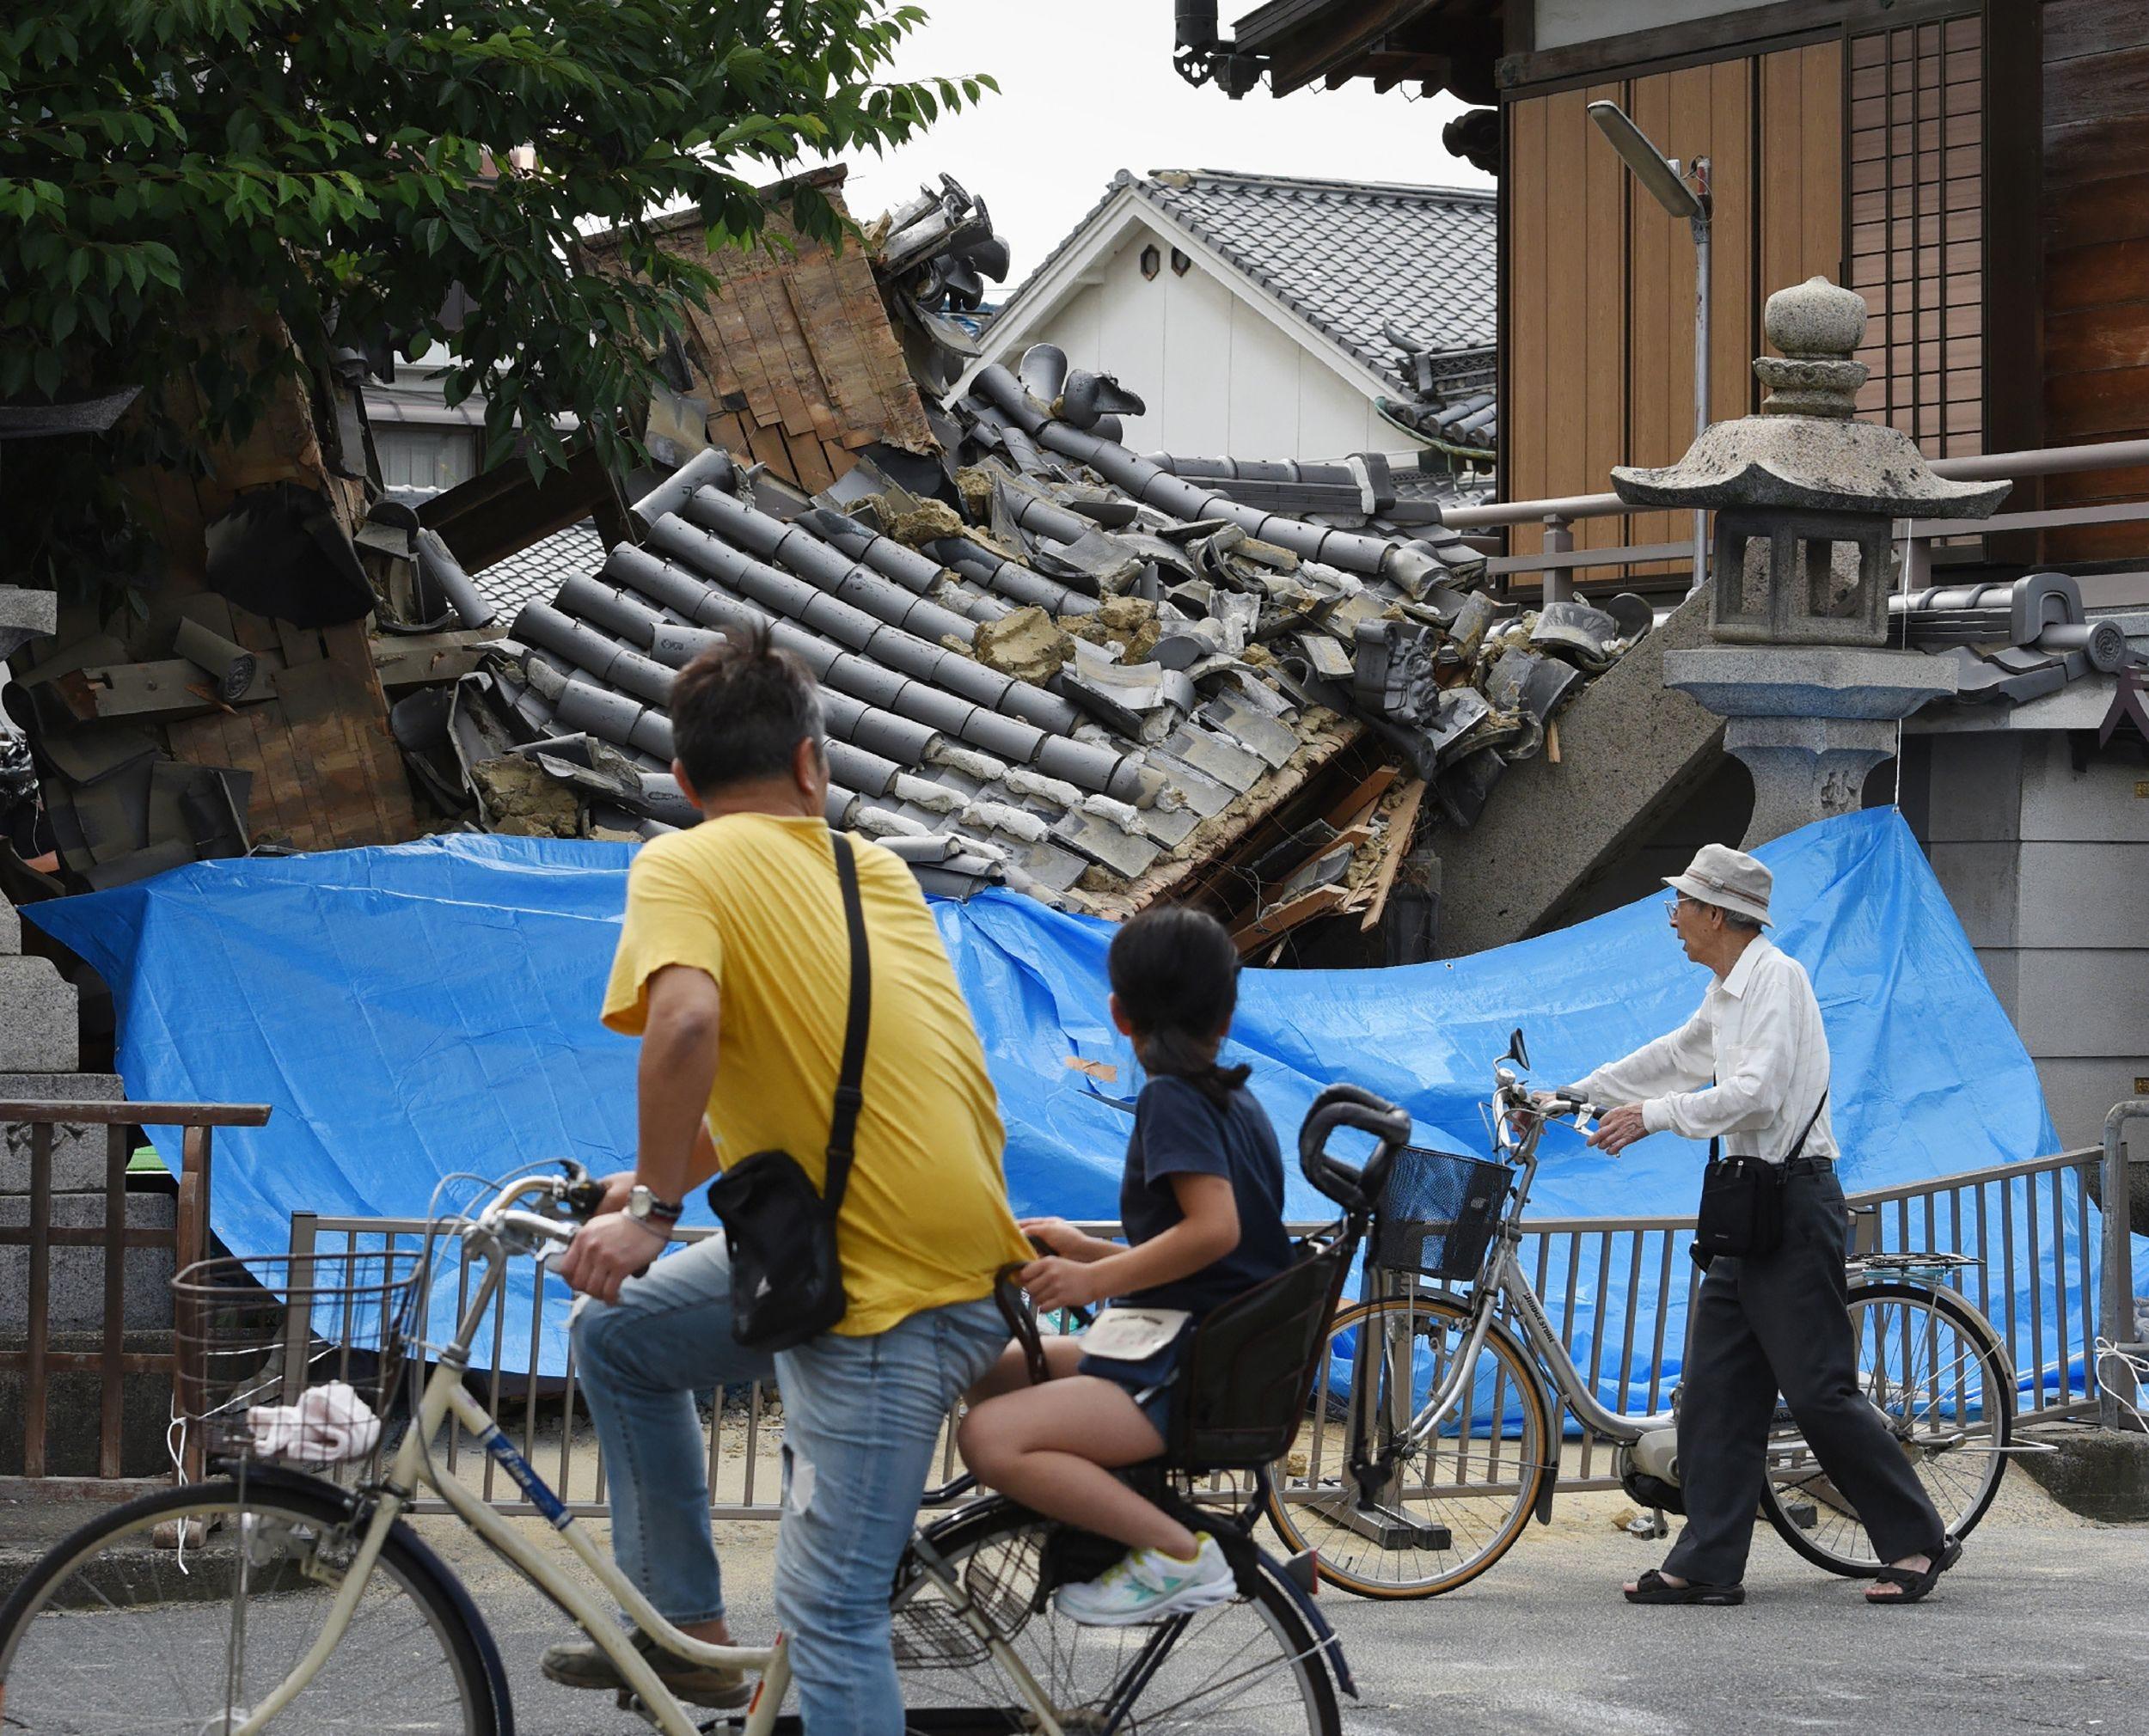 Strong earthquake near Osaka in Japan kills 3, injures hundreds